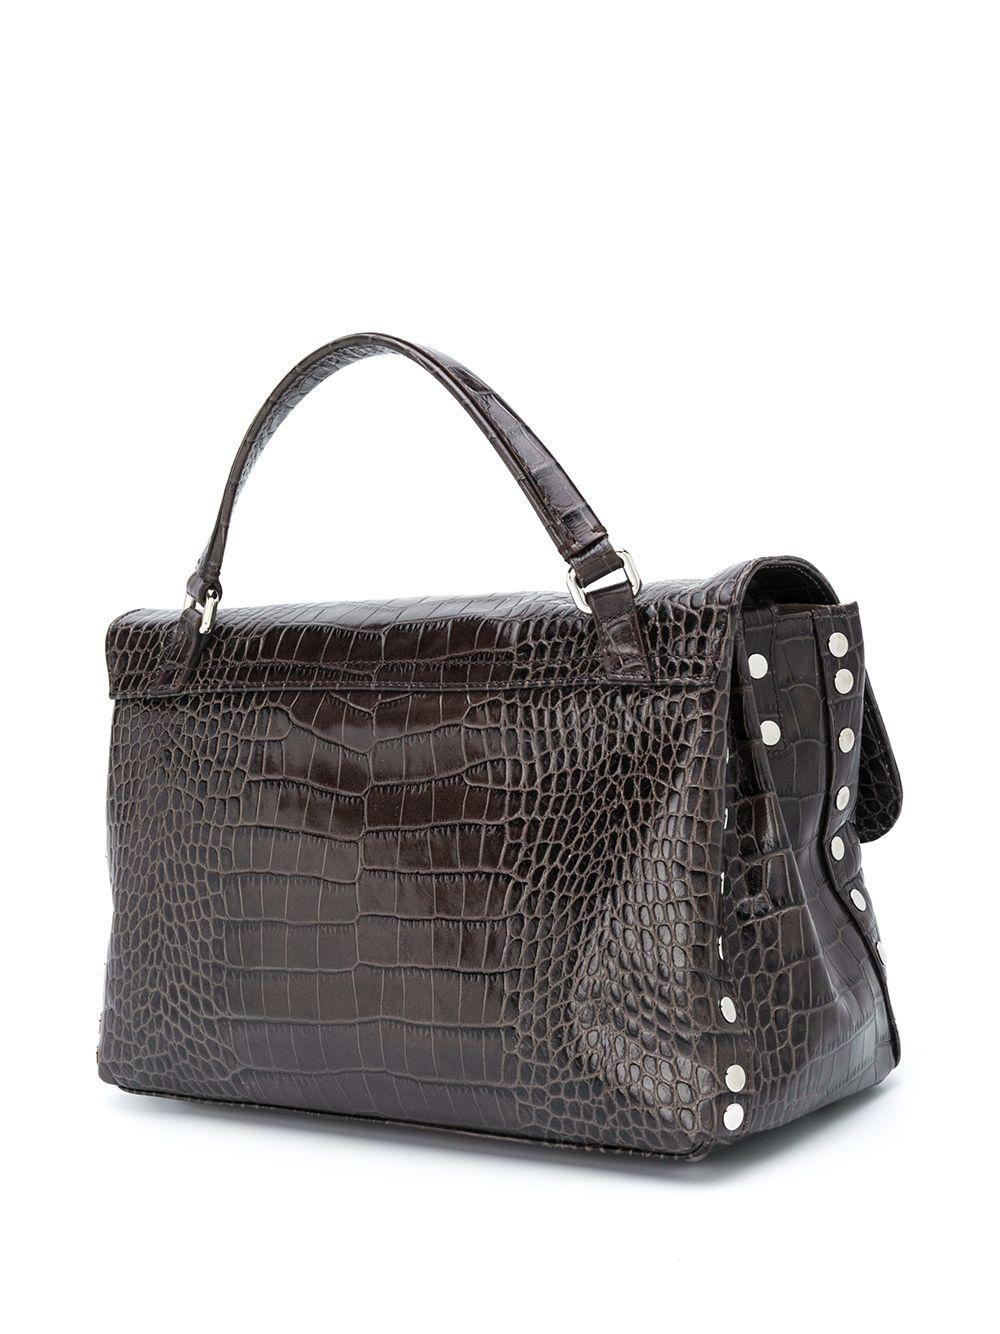 Picture of Zanellato | Croc-Embossed Leather Bag S